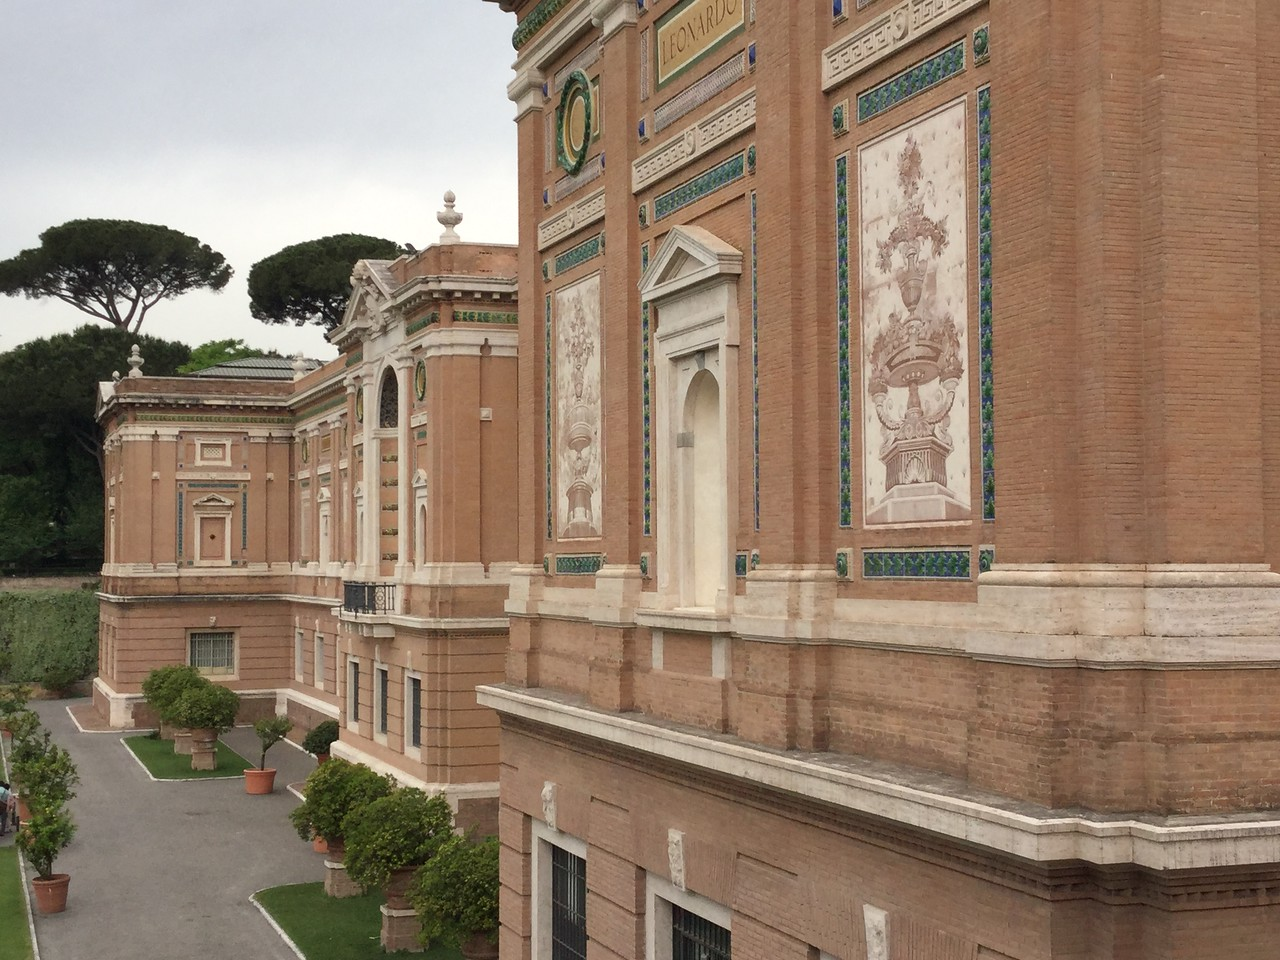 Start of the Vatican tour